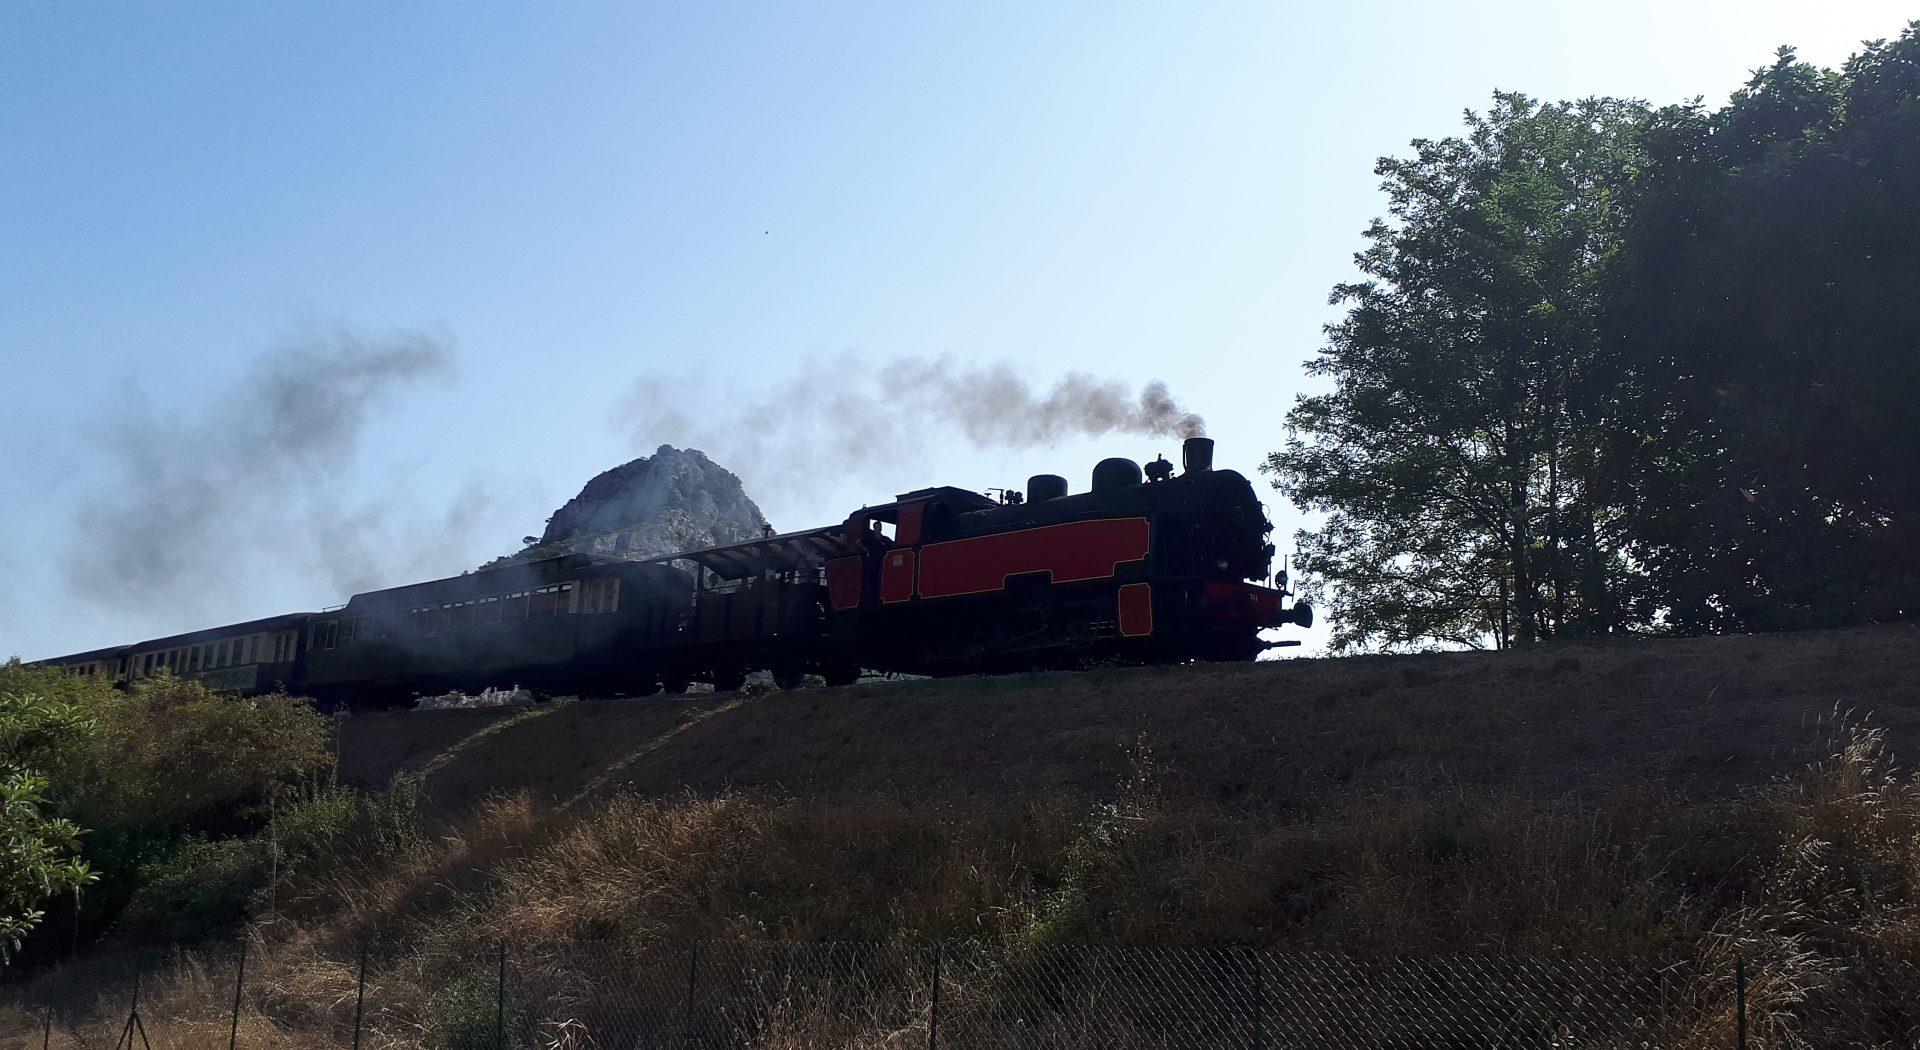 anduze train vapeur gard - juliesliberties